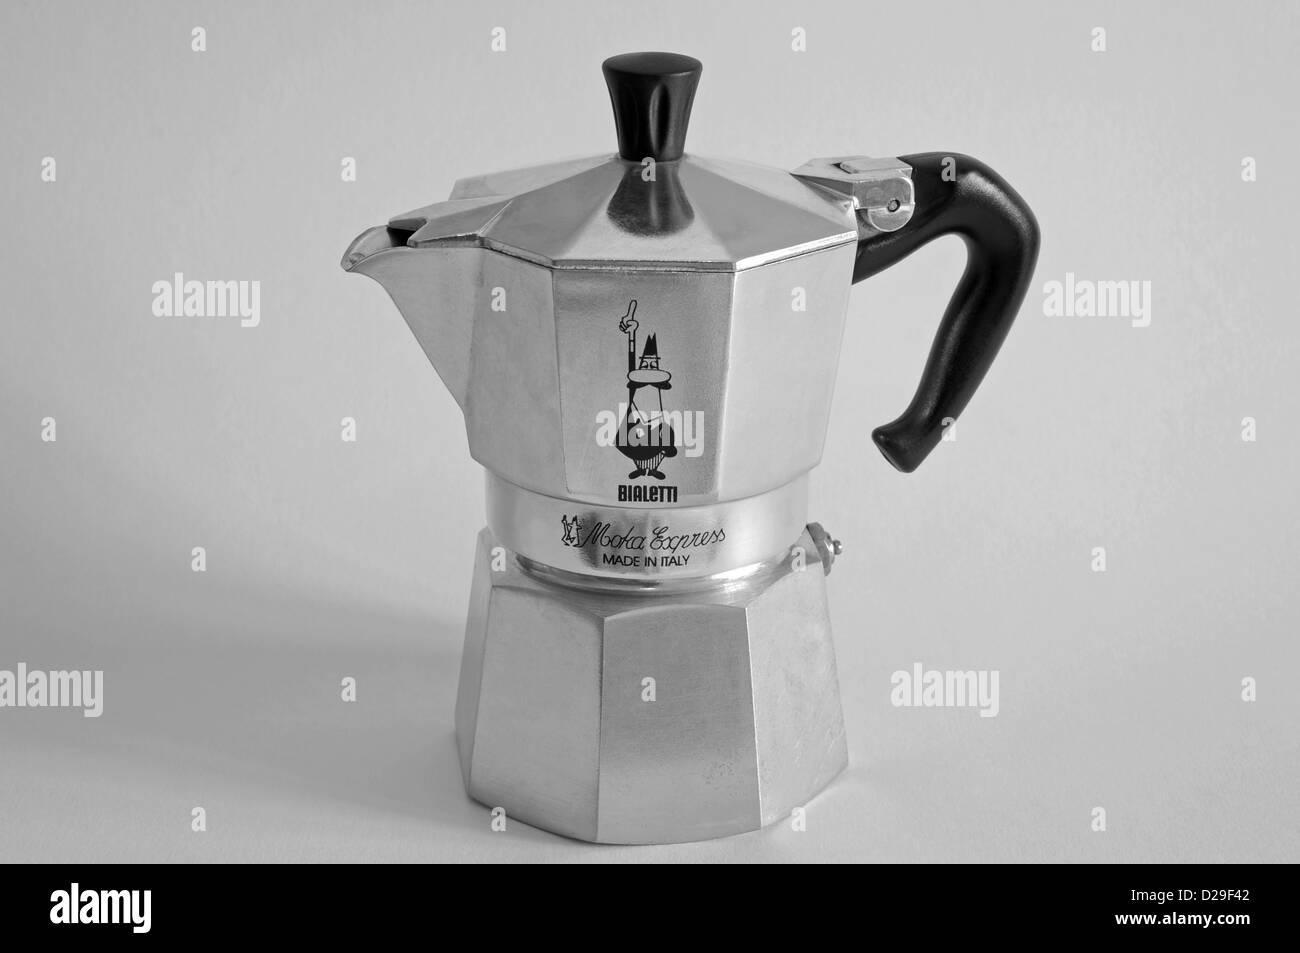 Bialetti moka express coffee pot - Stock Image